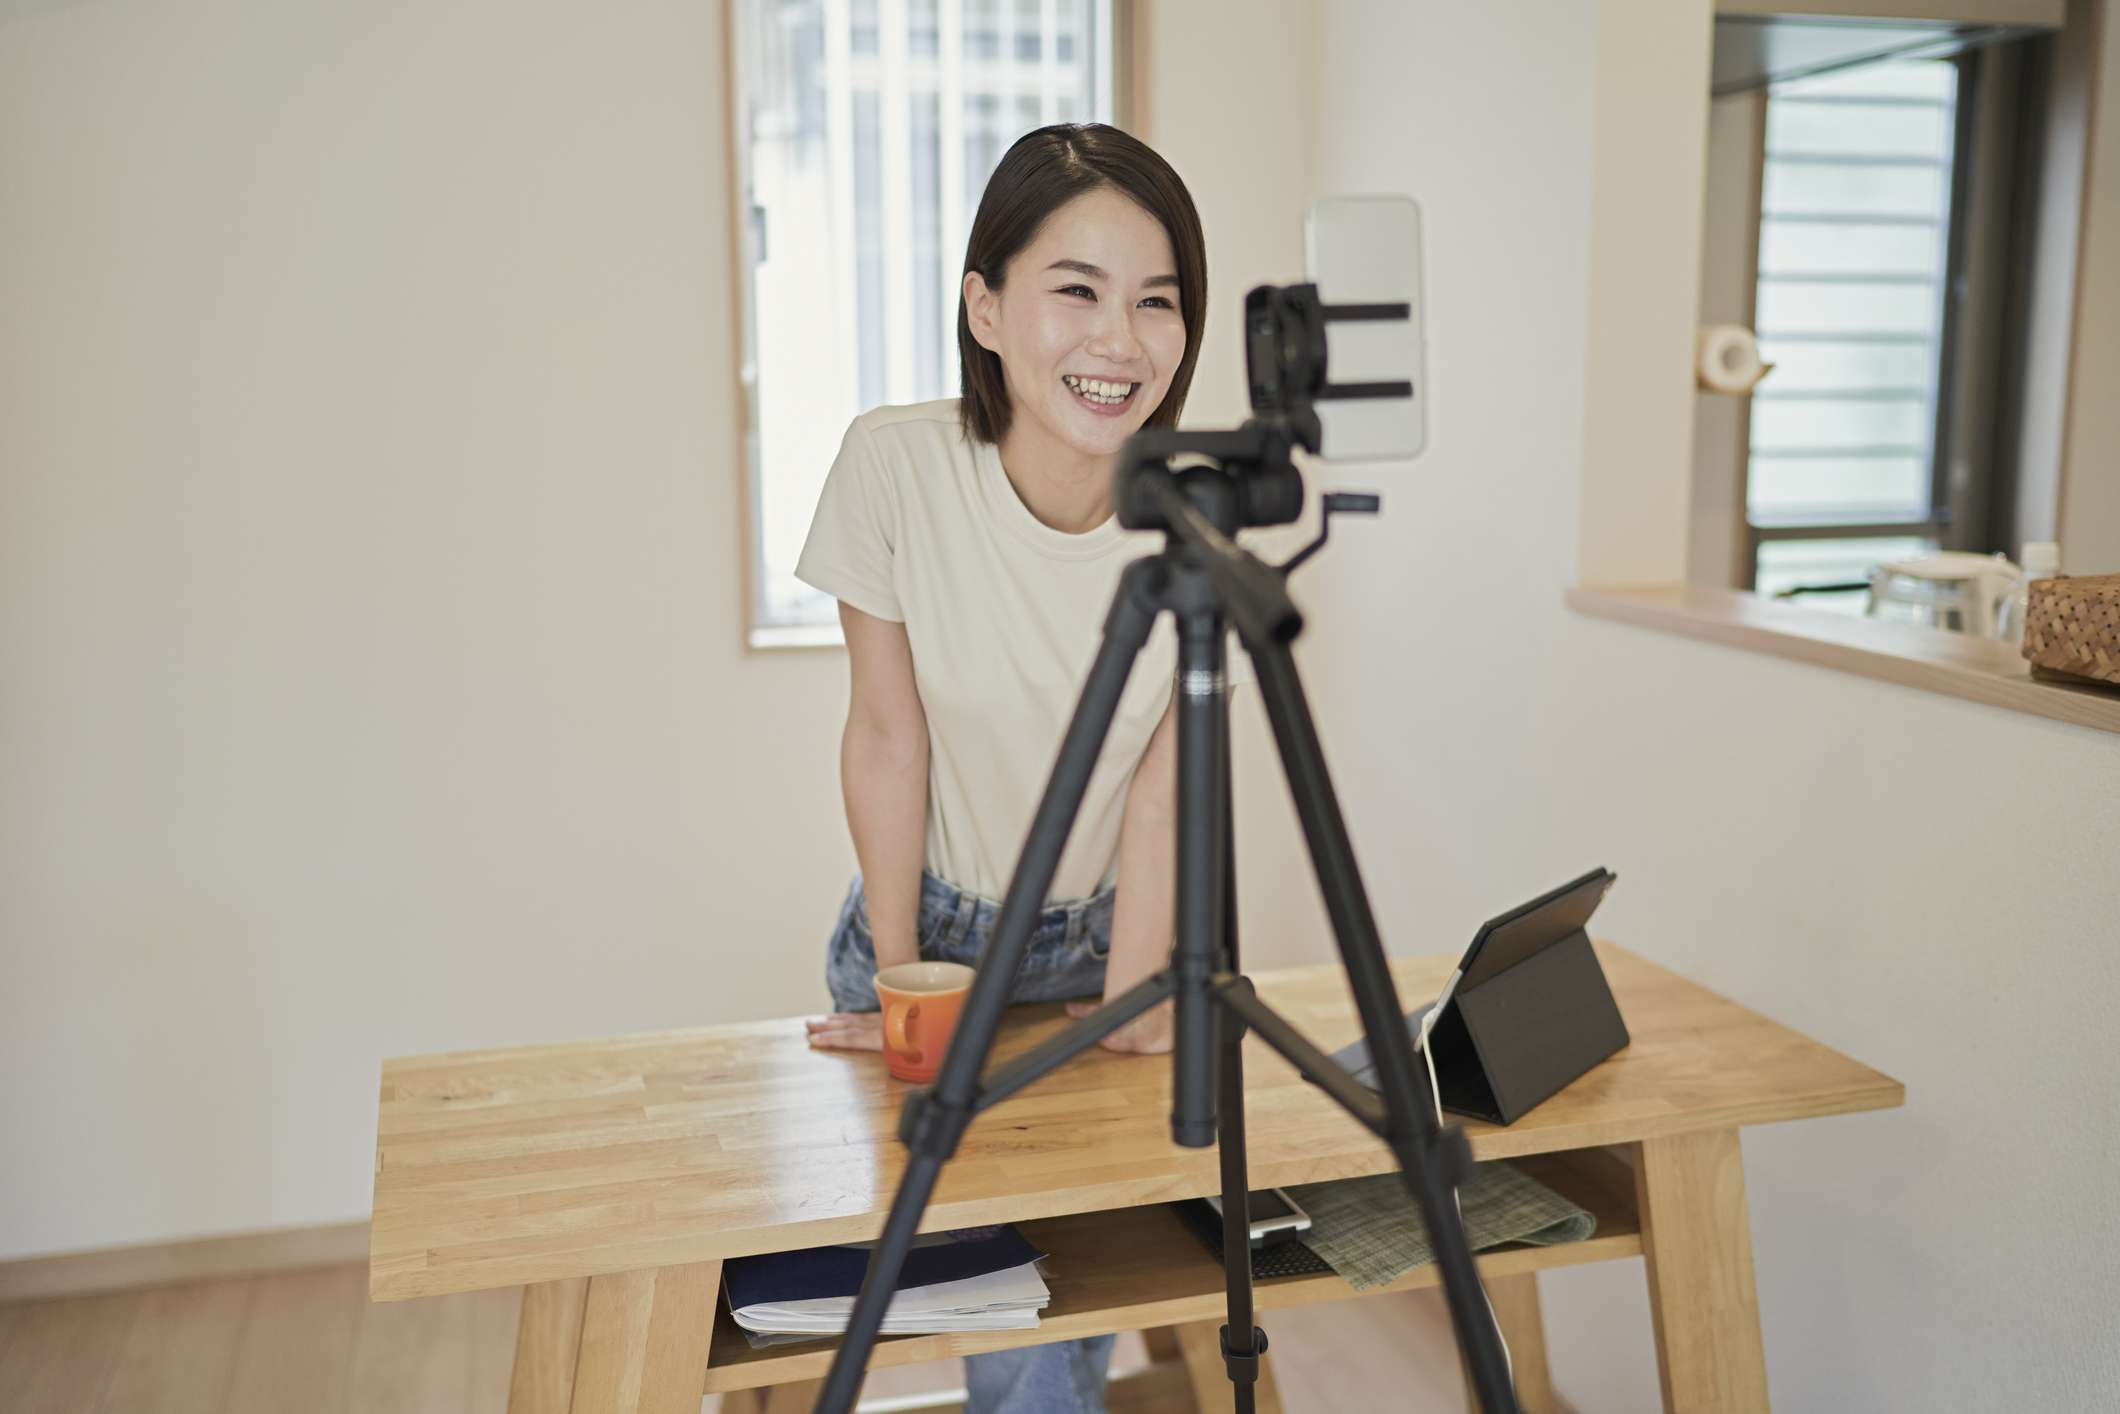 Woman livestreaming